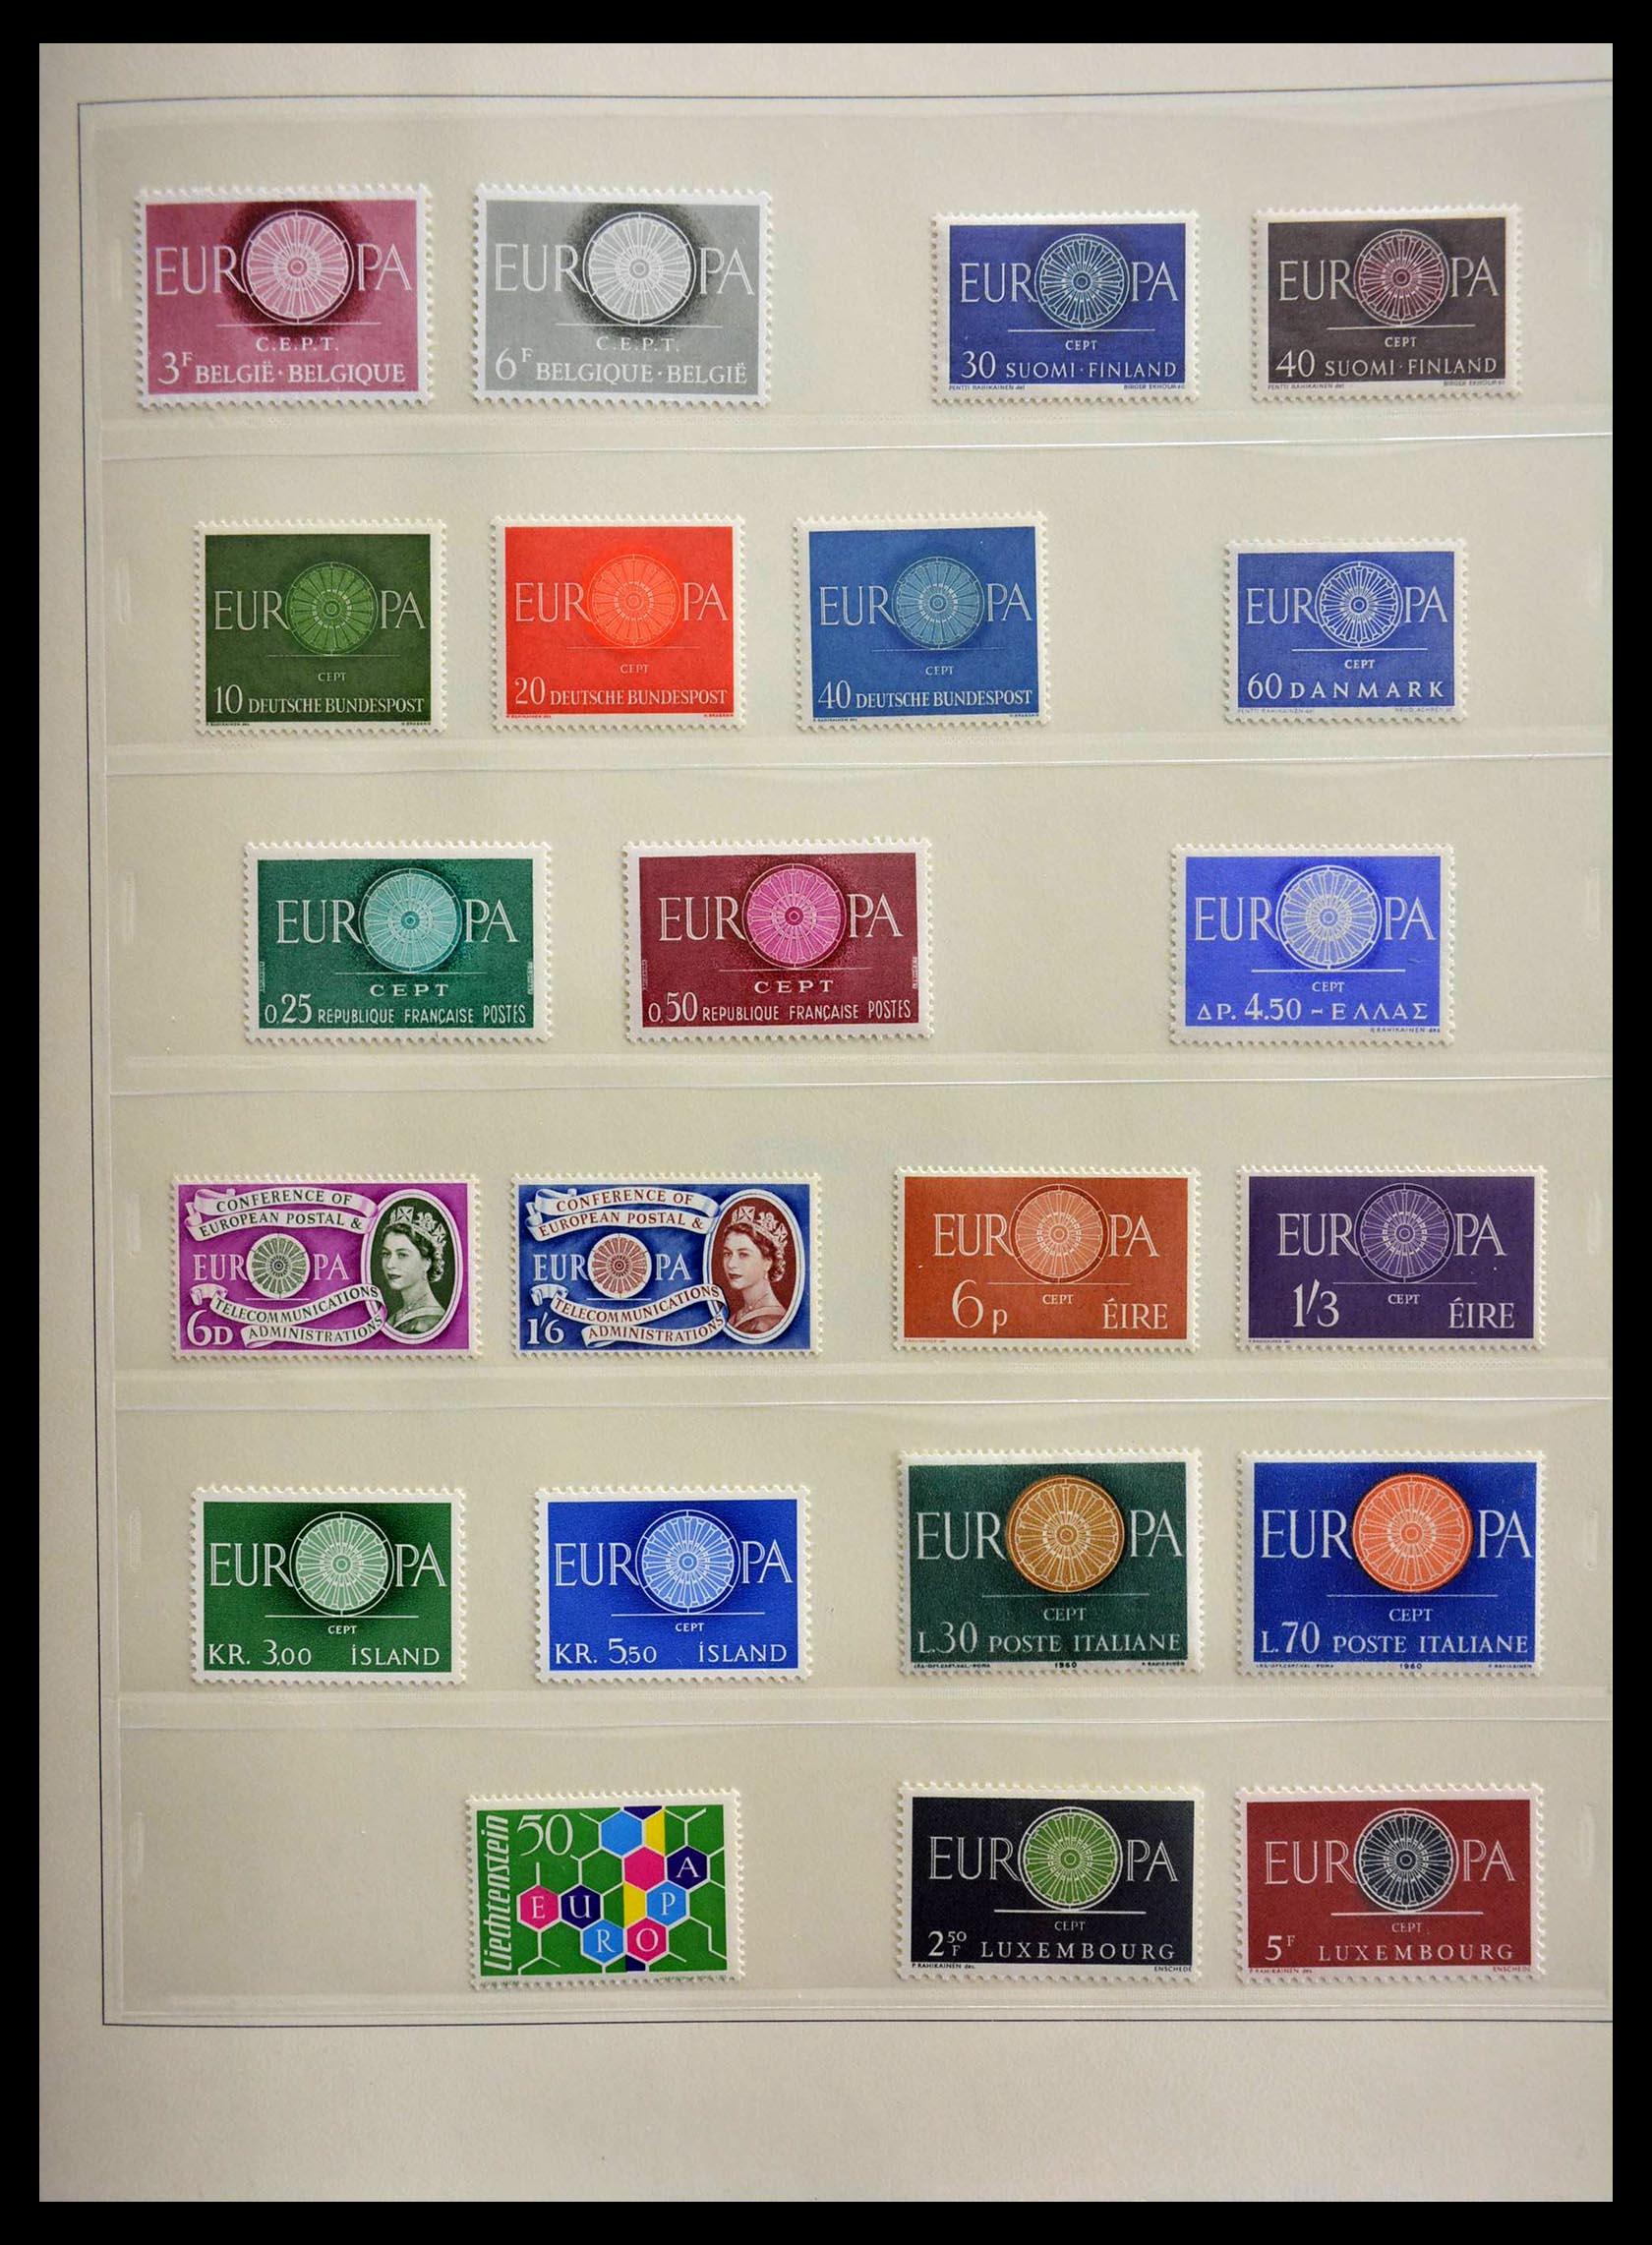 28637 005 - 28637 Europe Cept 1956-2000.